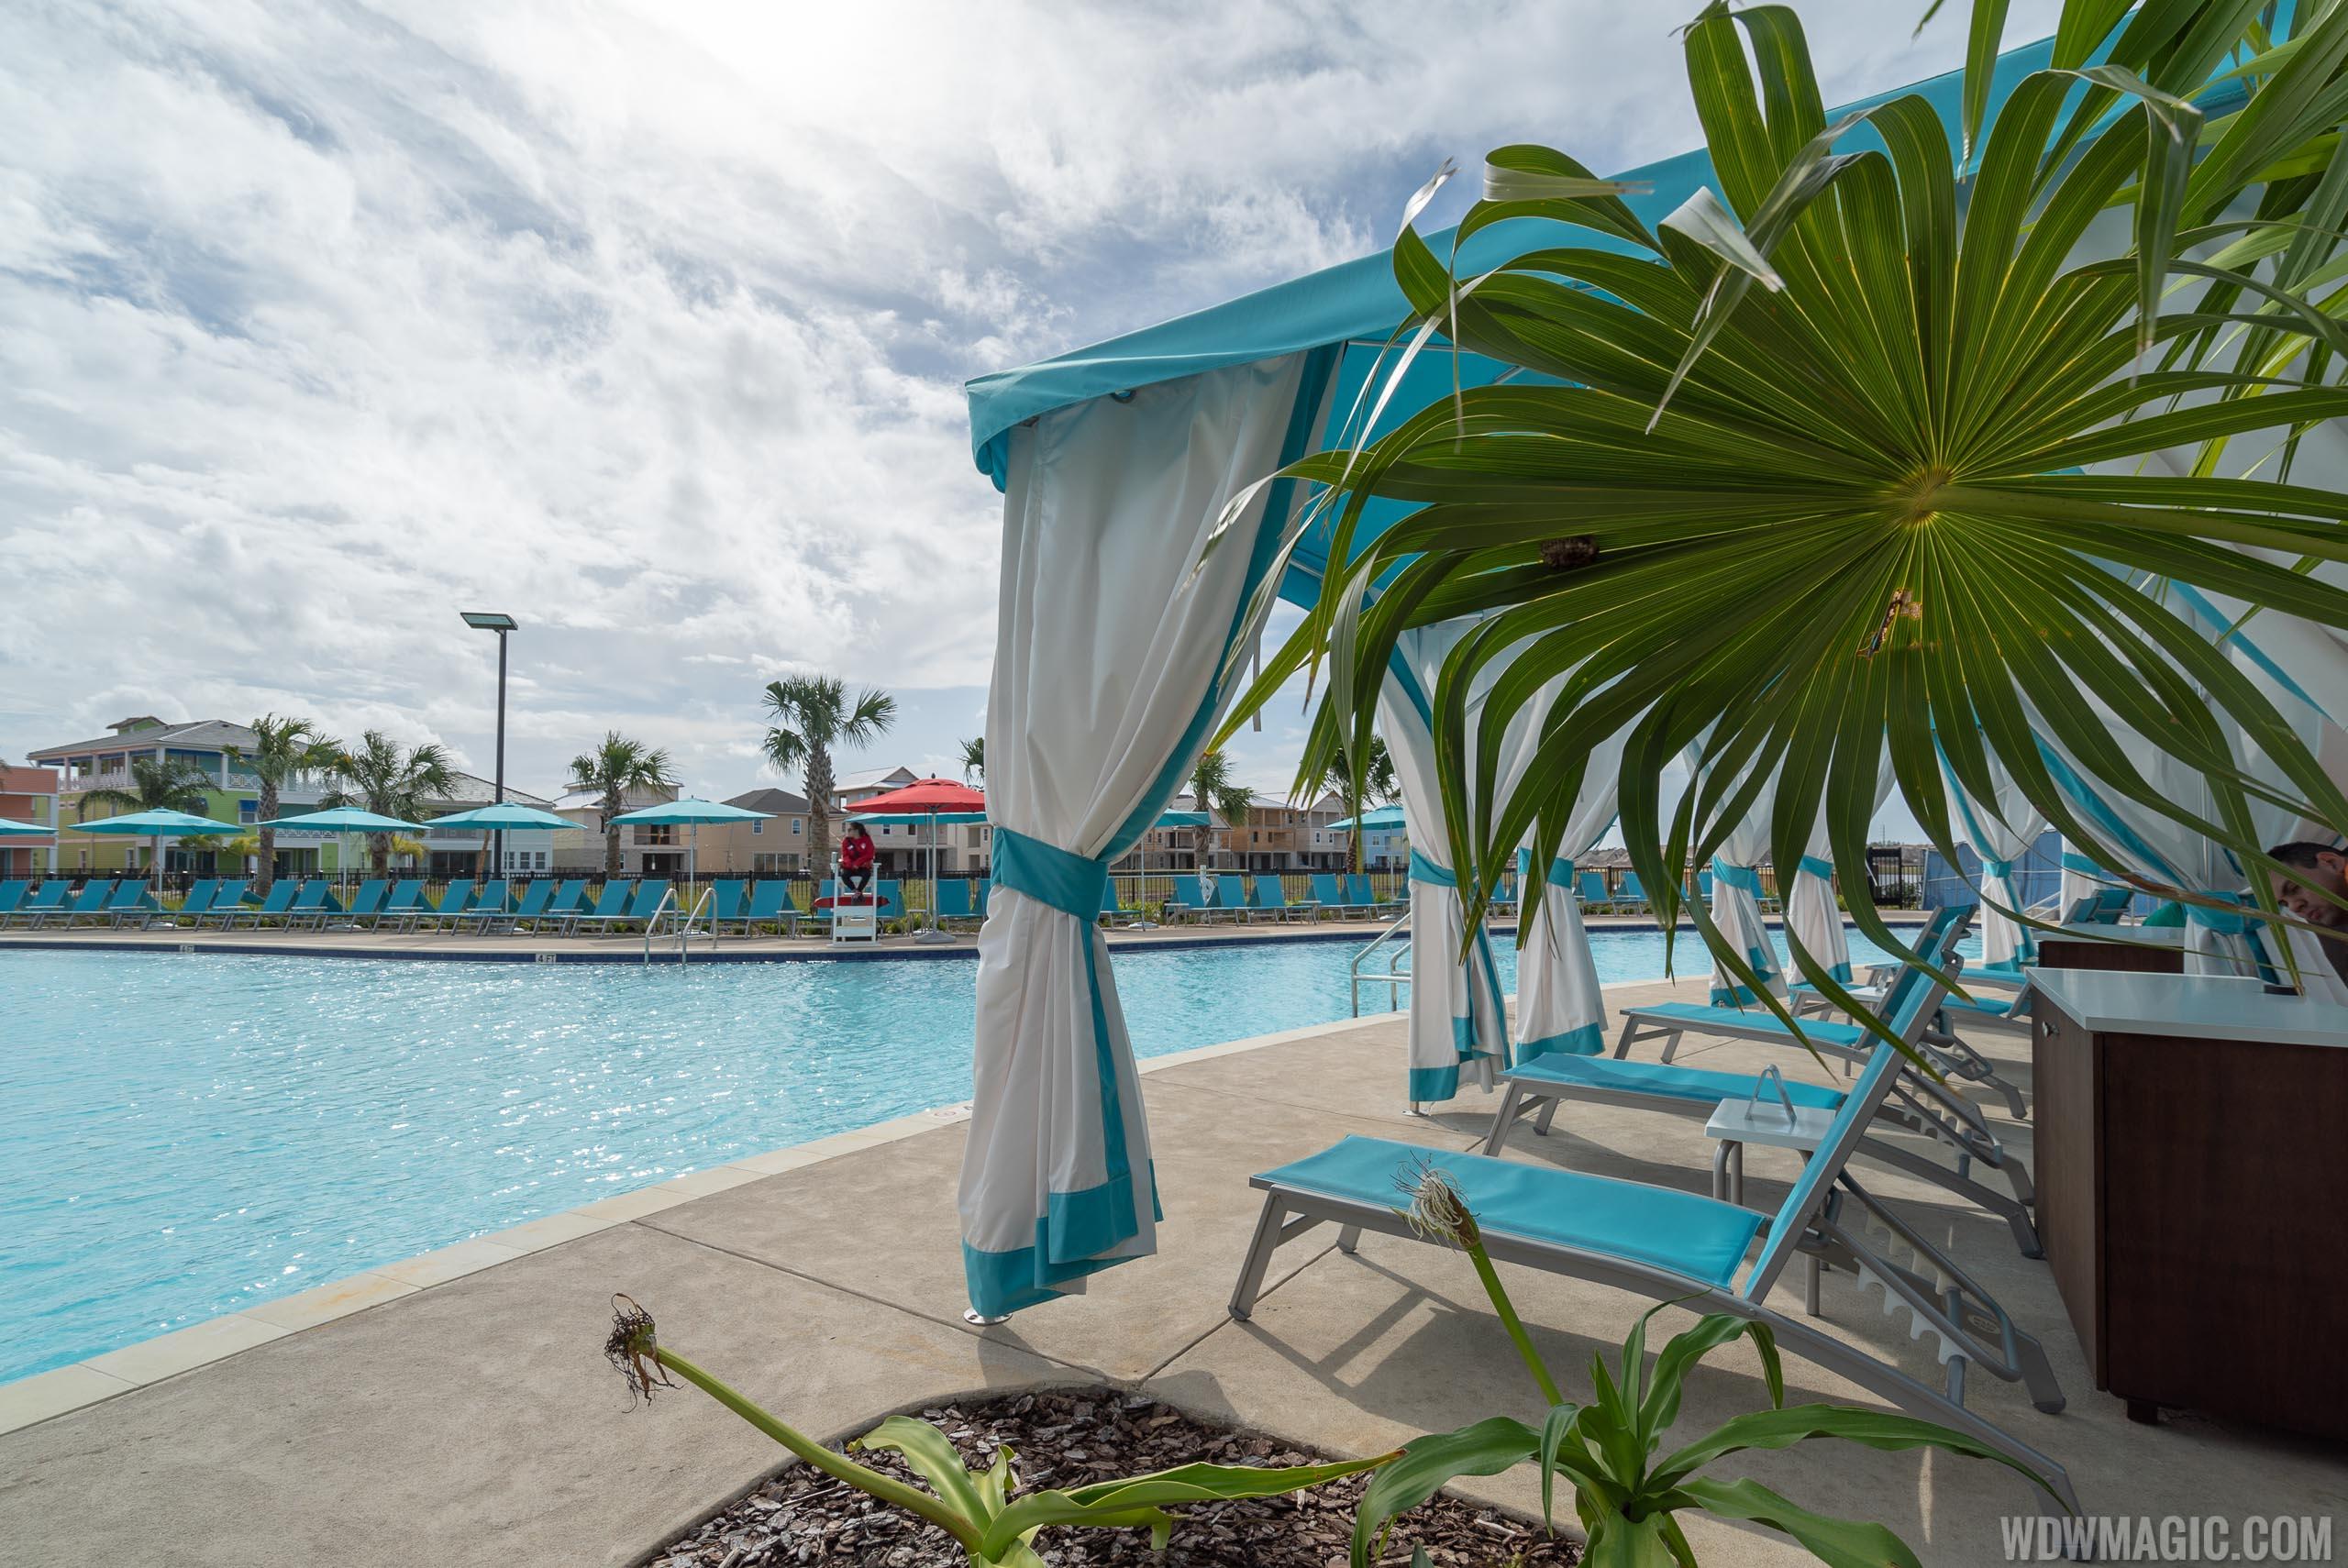 Margaritaville Resort Orlando tour